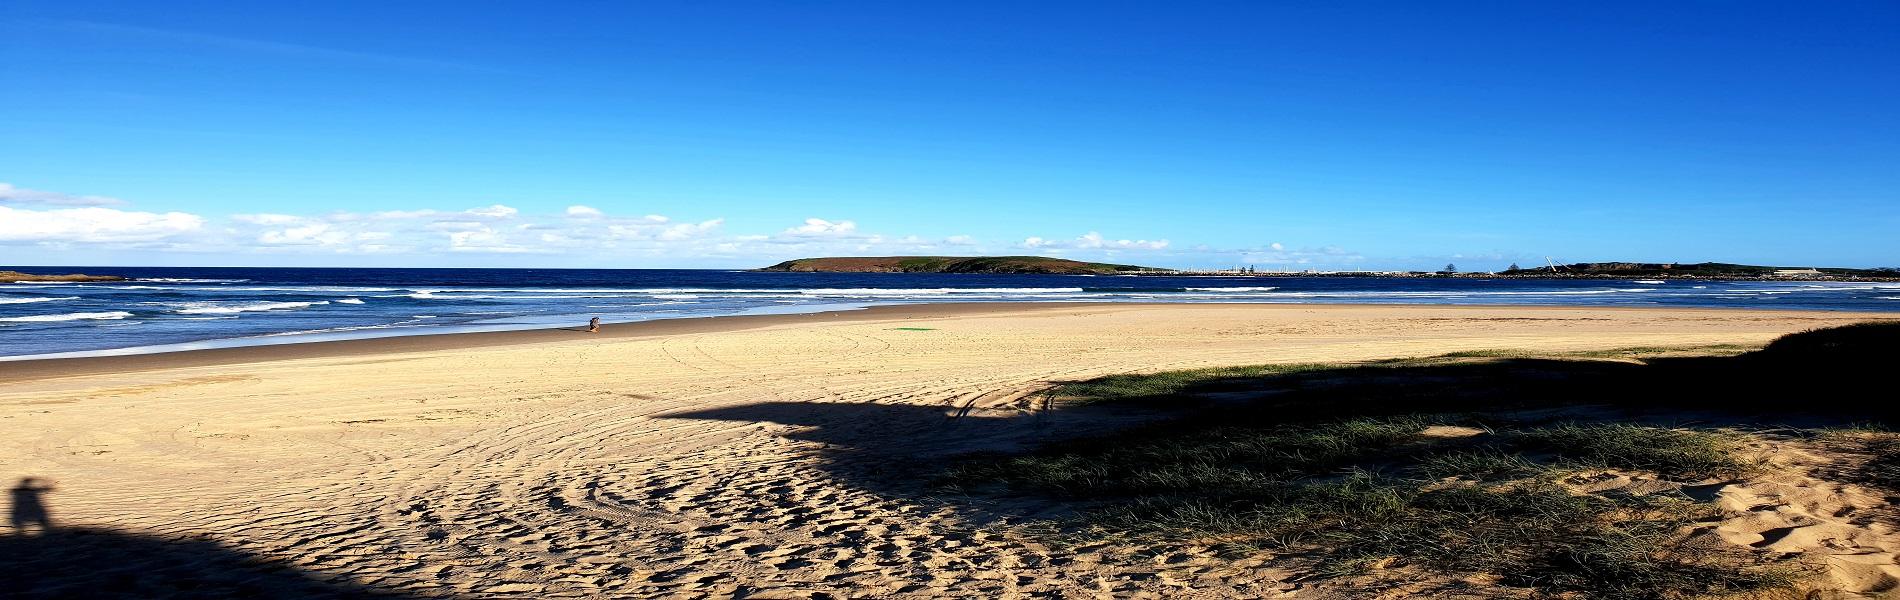 Coffs Harbour Beaches